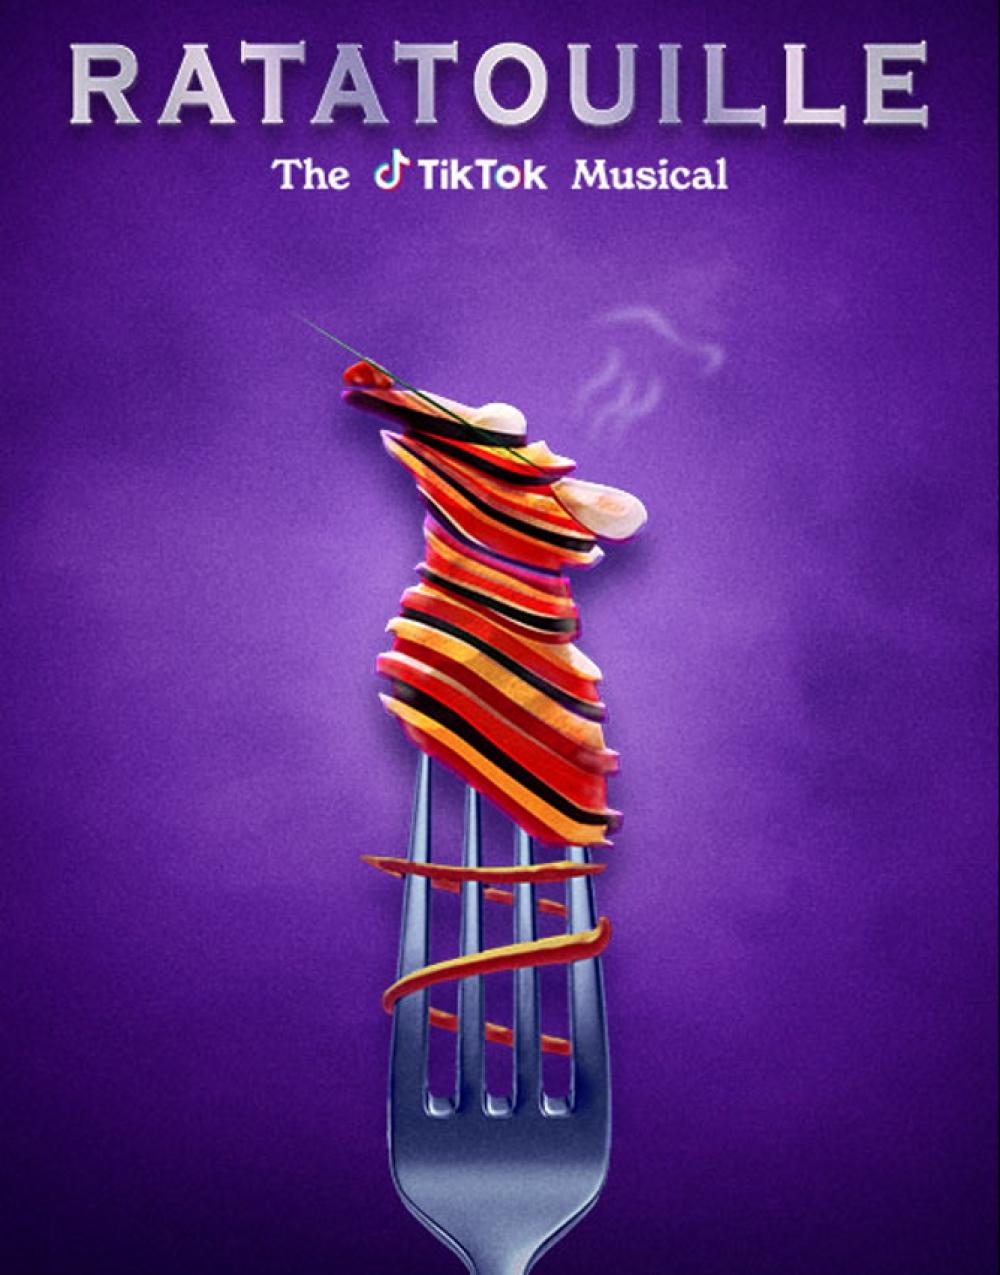 Ratatouille: The TikTok Musical at